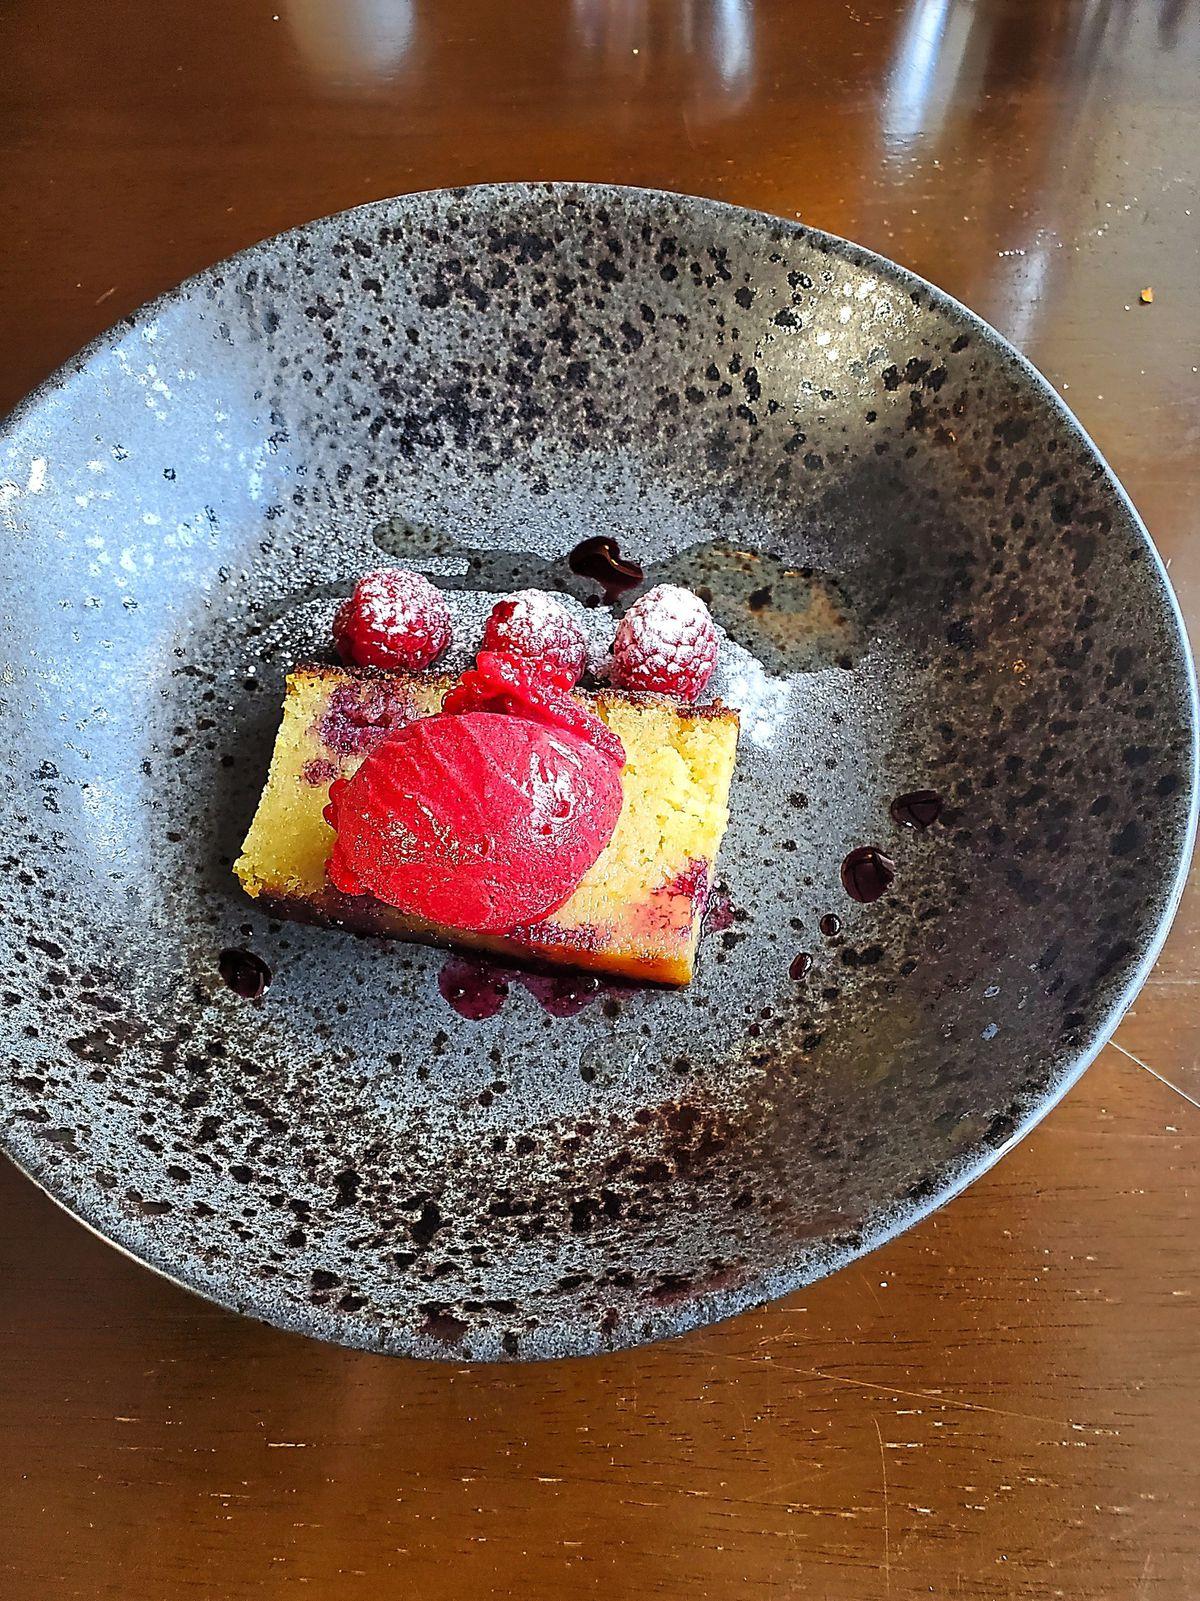 Lemon frangipane with raspberry sorbet